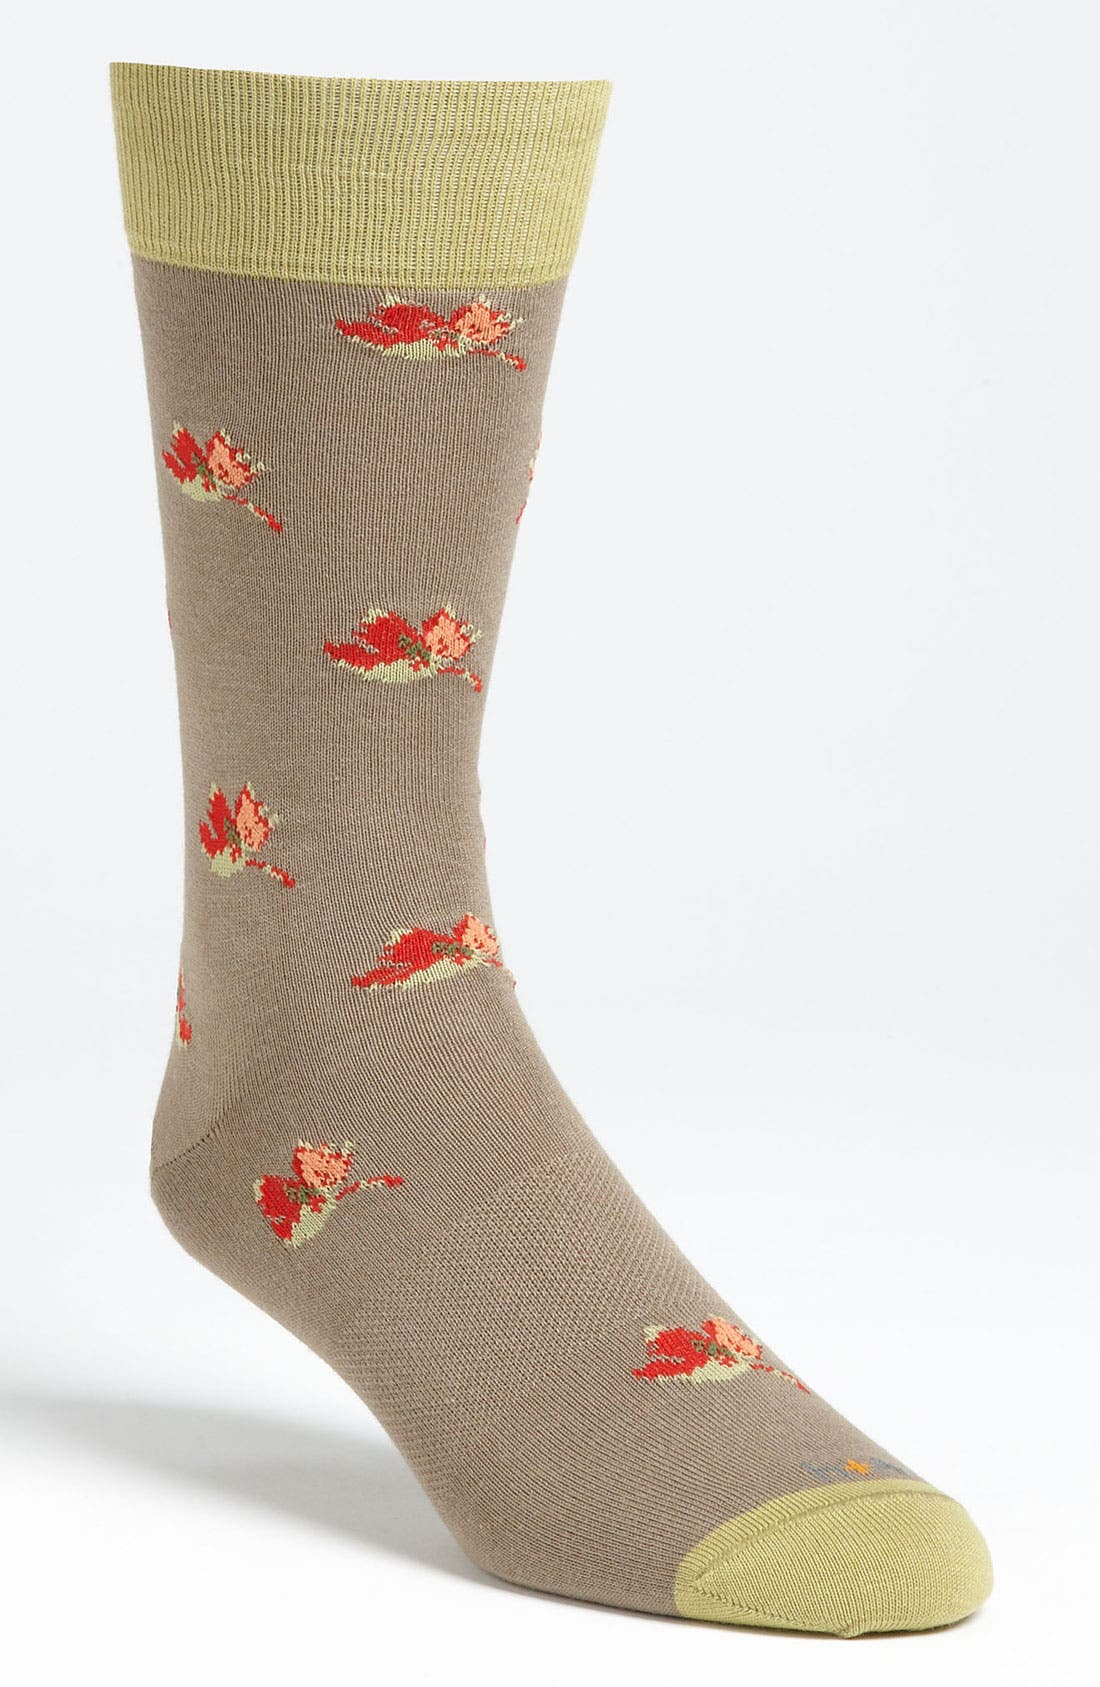 Alternate Image 1 Selected - hook + ALBERT 'Falling Leaves' Socks